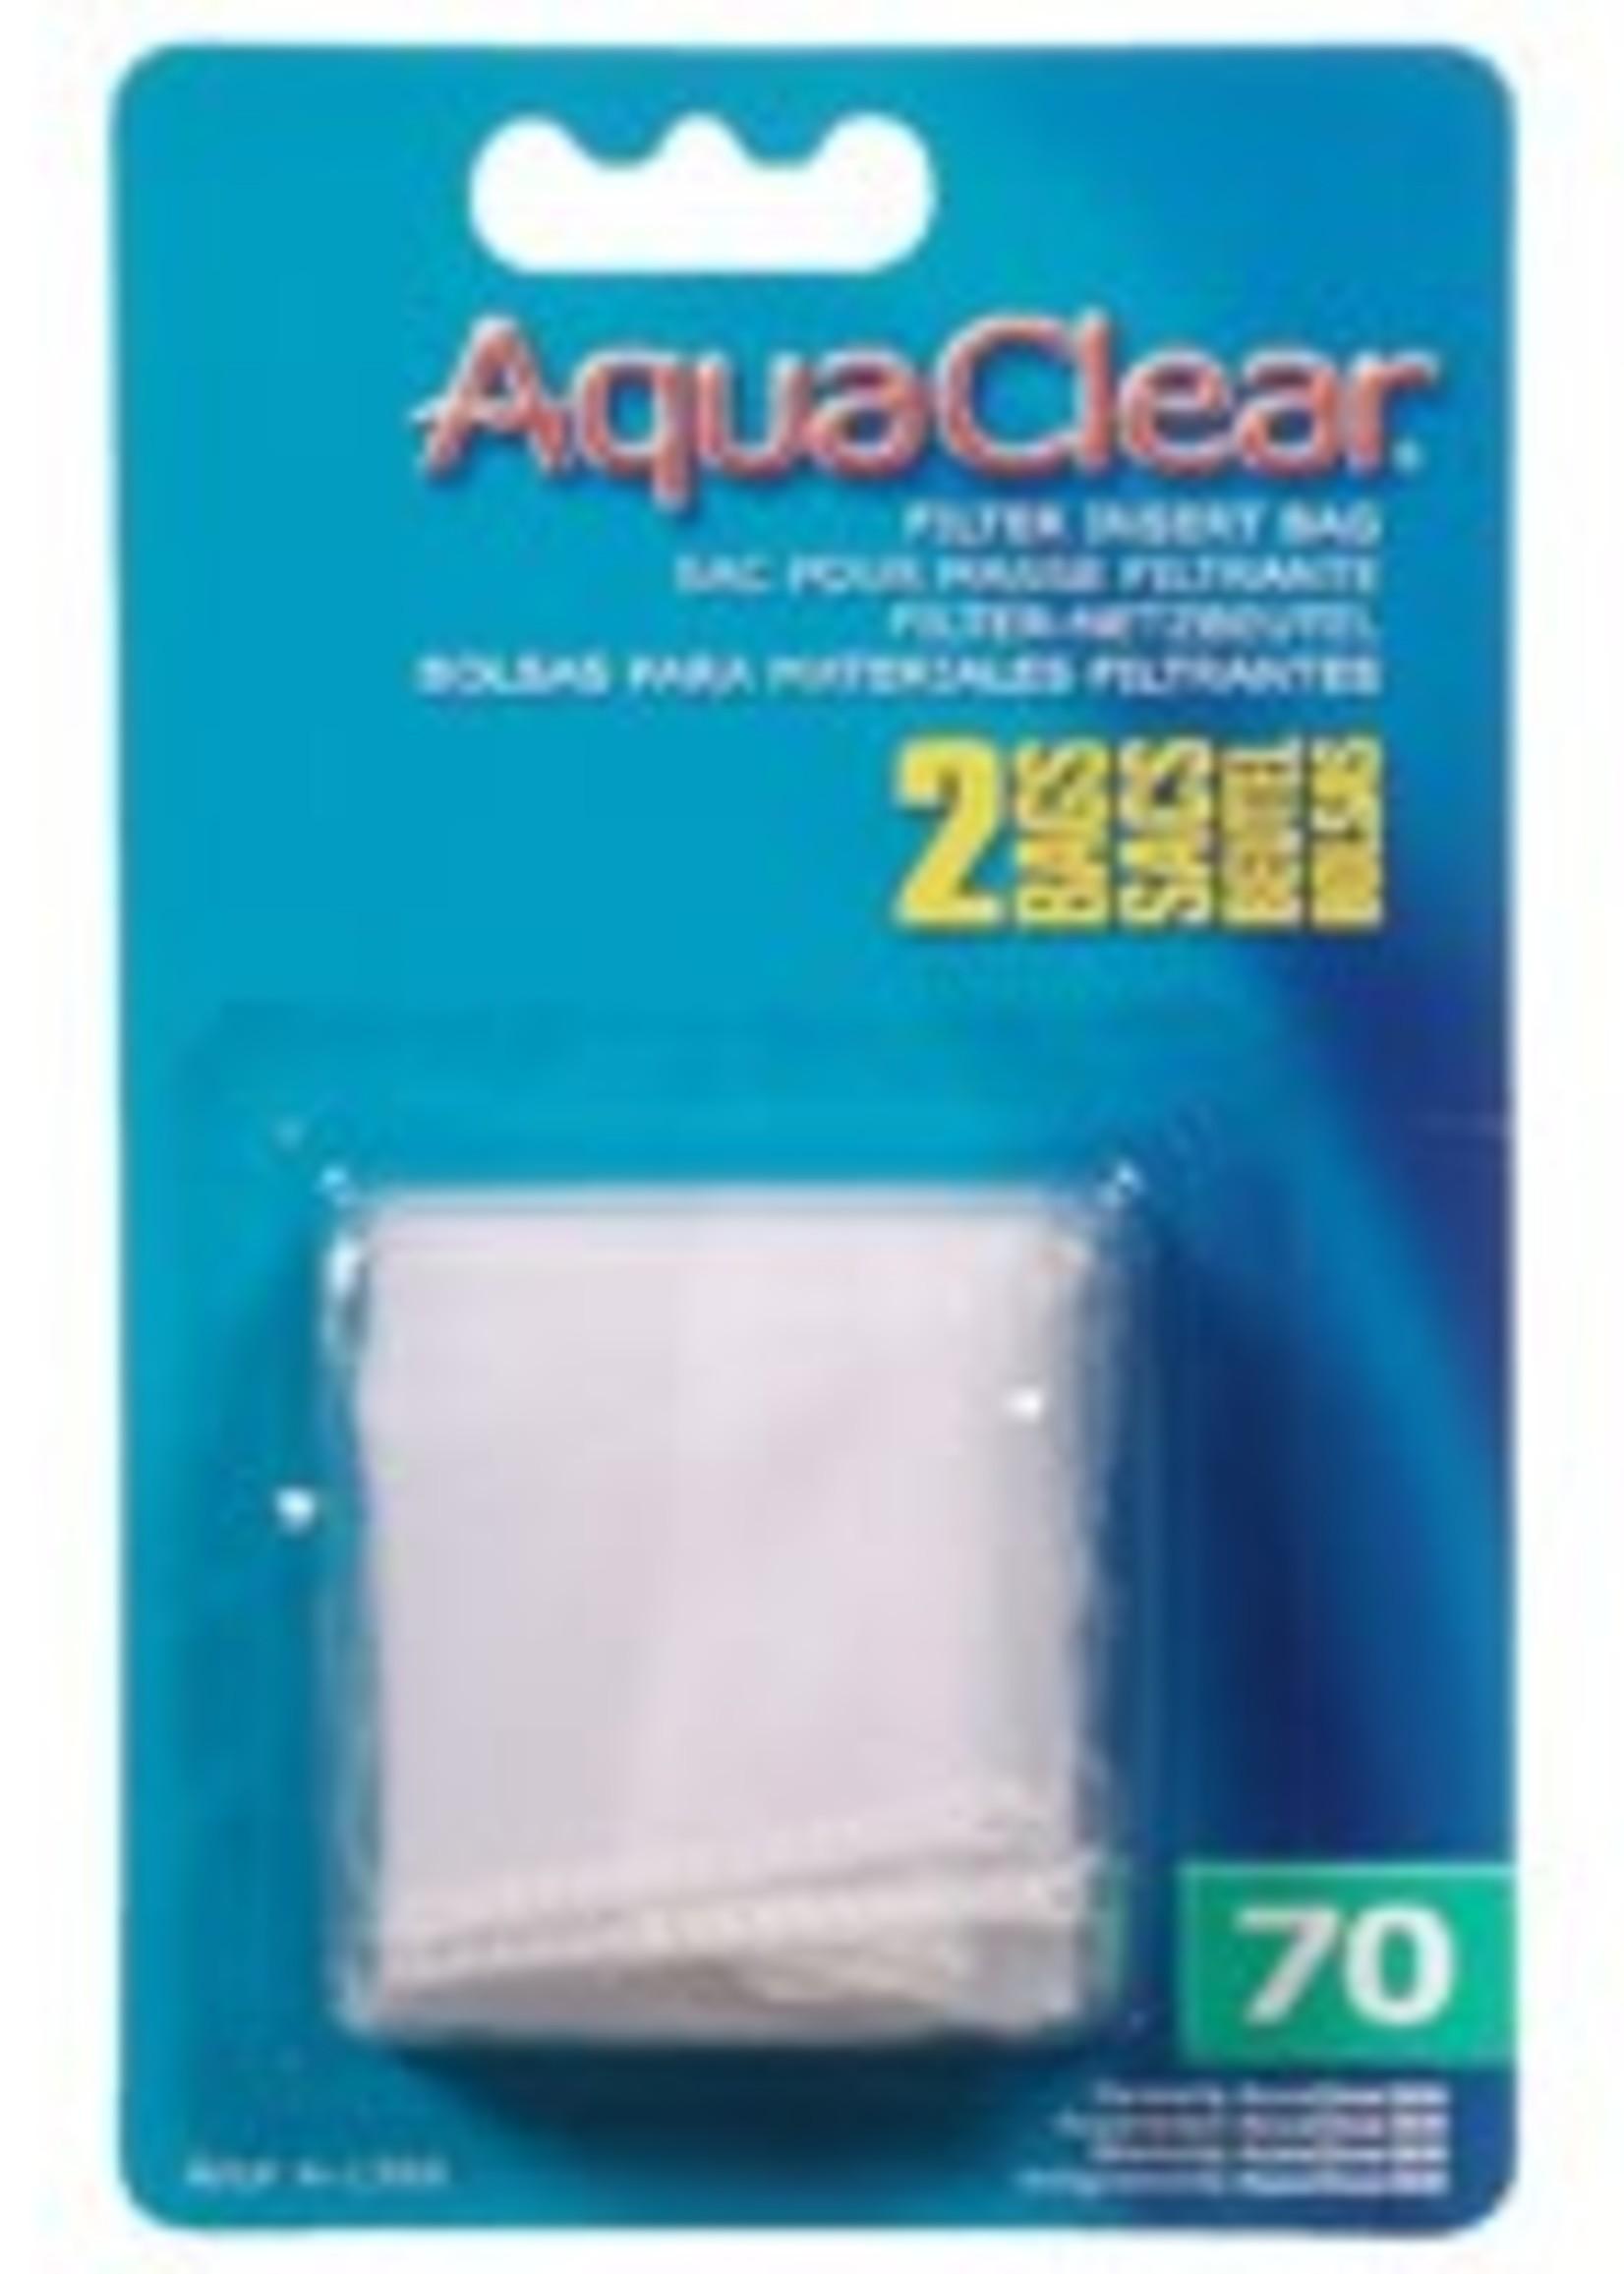 AquaClear Nylon Filter Media Bags for AquaClear 70 Power Filter, 2 pack